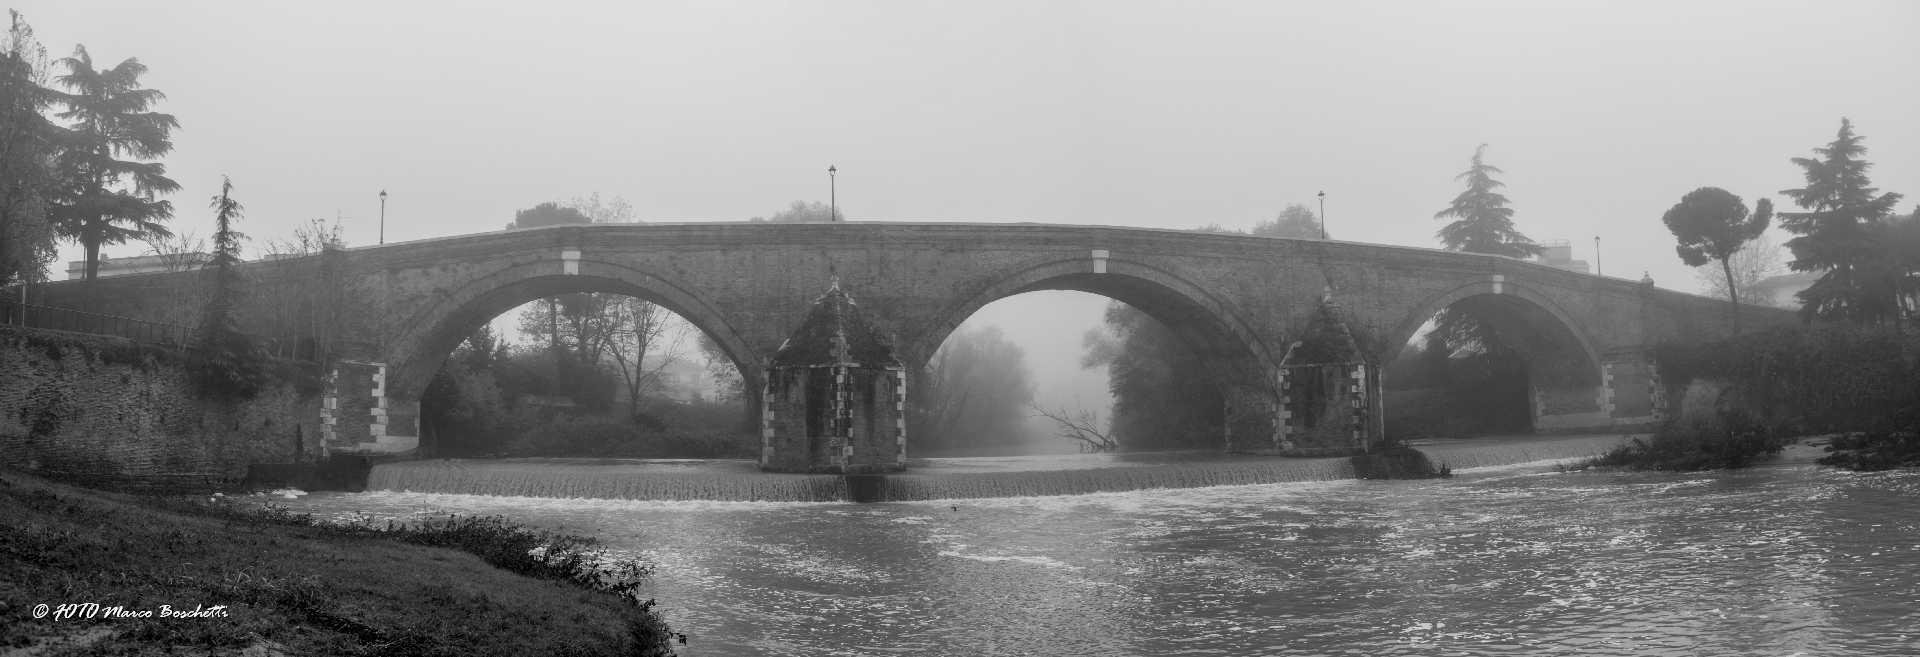 Panoramica ponte vecchio - Boschettim65 - Cesena (FC)